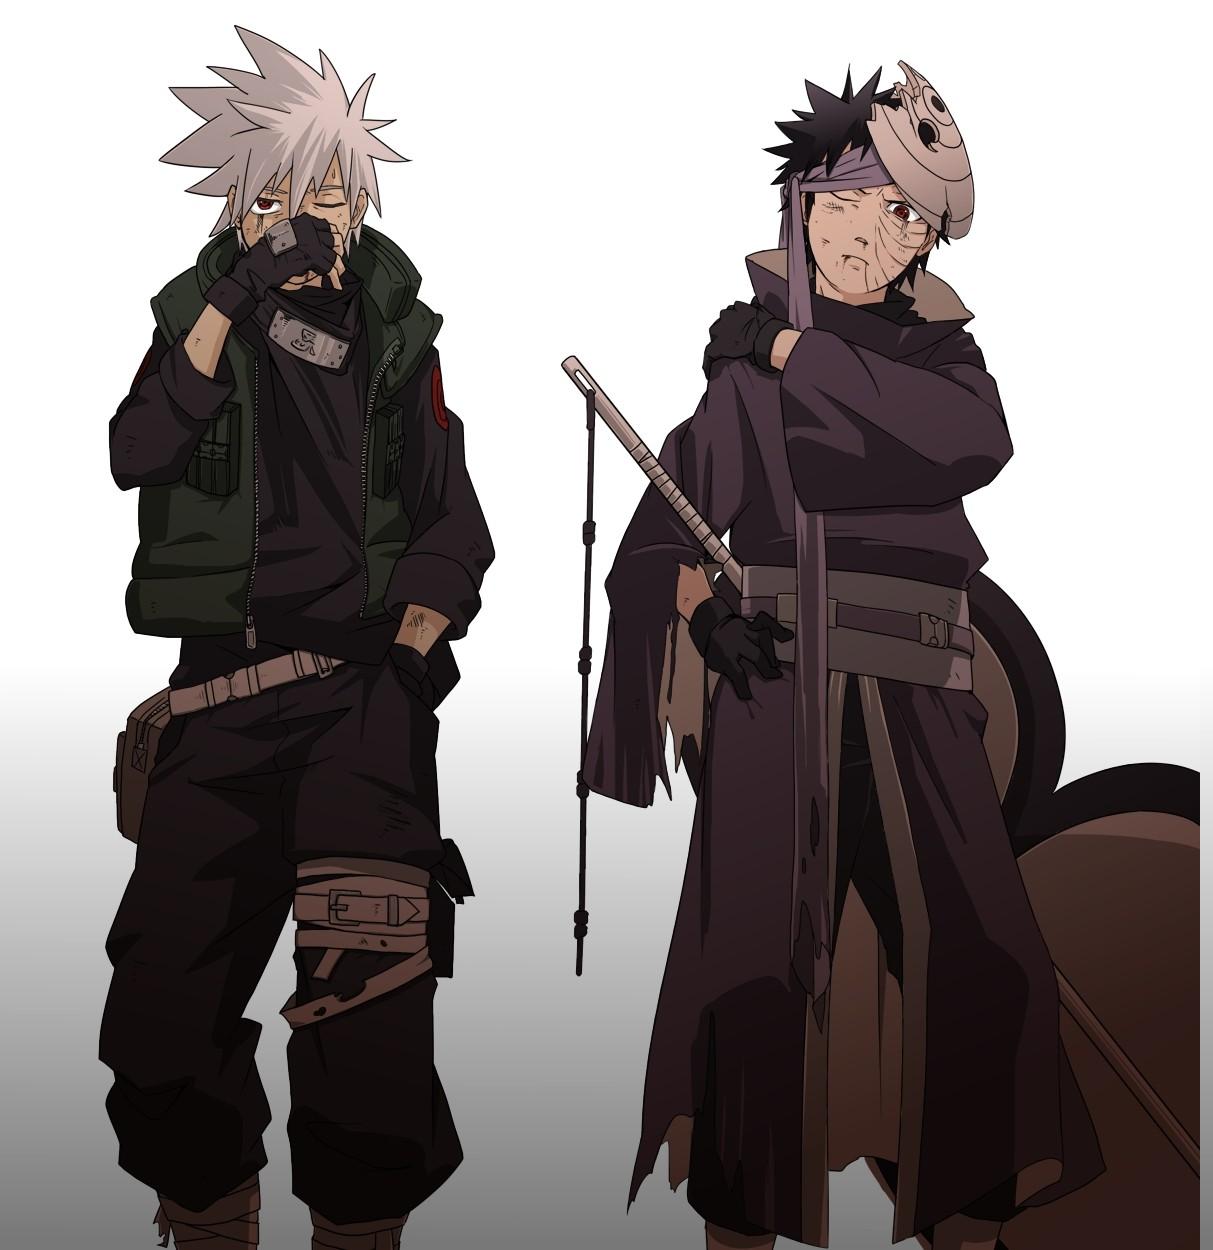 Wallpaper Kakashi Anime: Wallpaper : Anime Boys, Weapon, Artwork, Hatake Kakashi